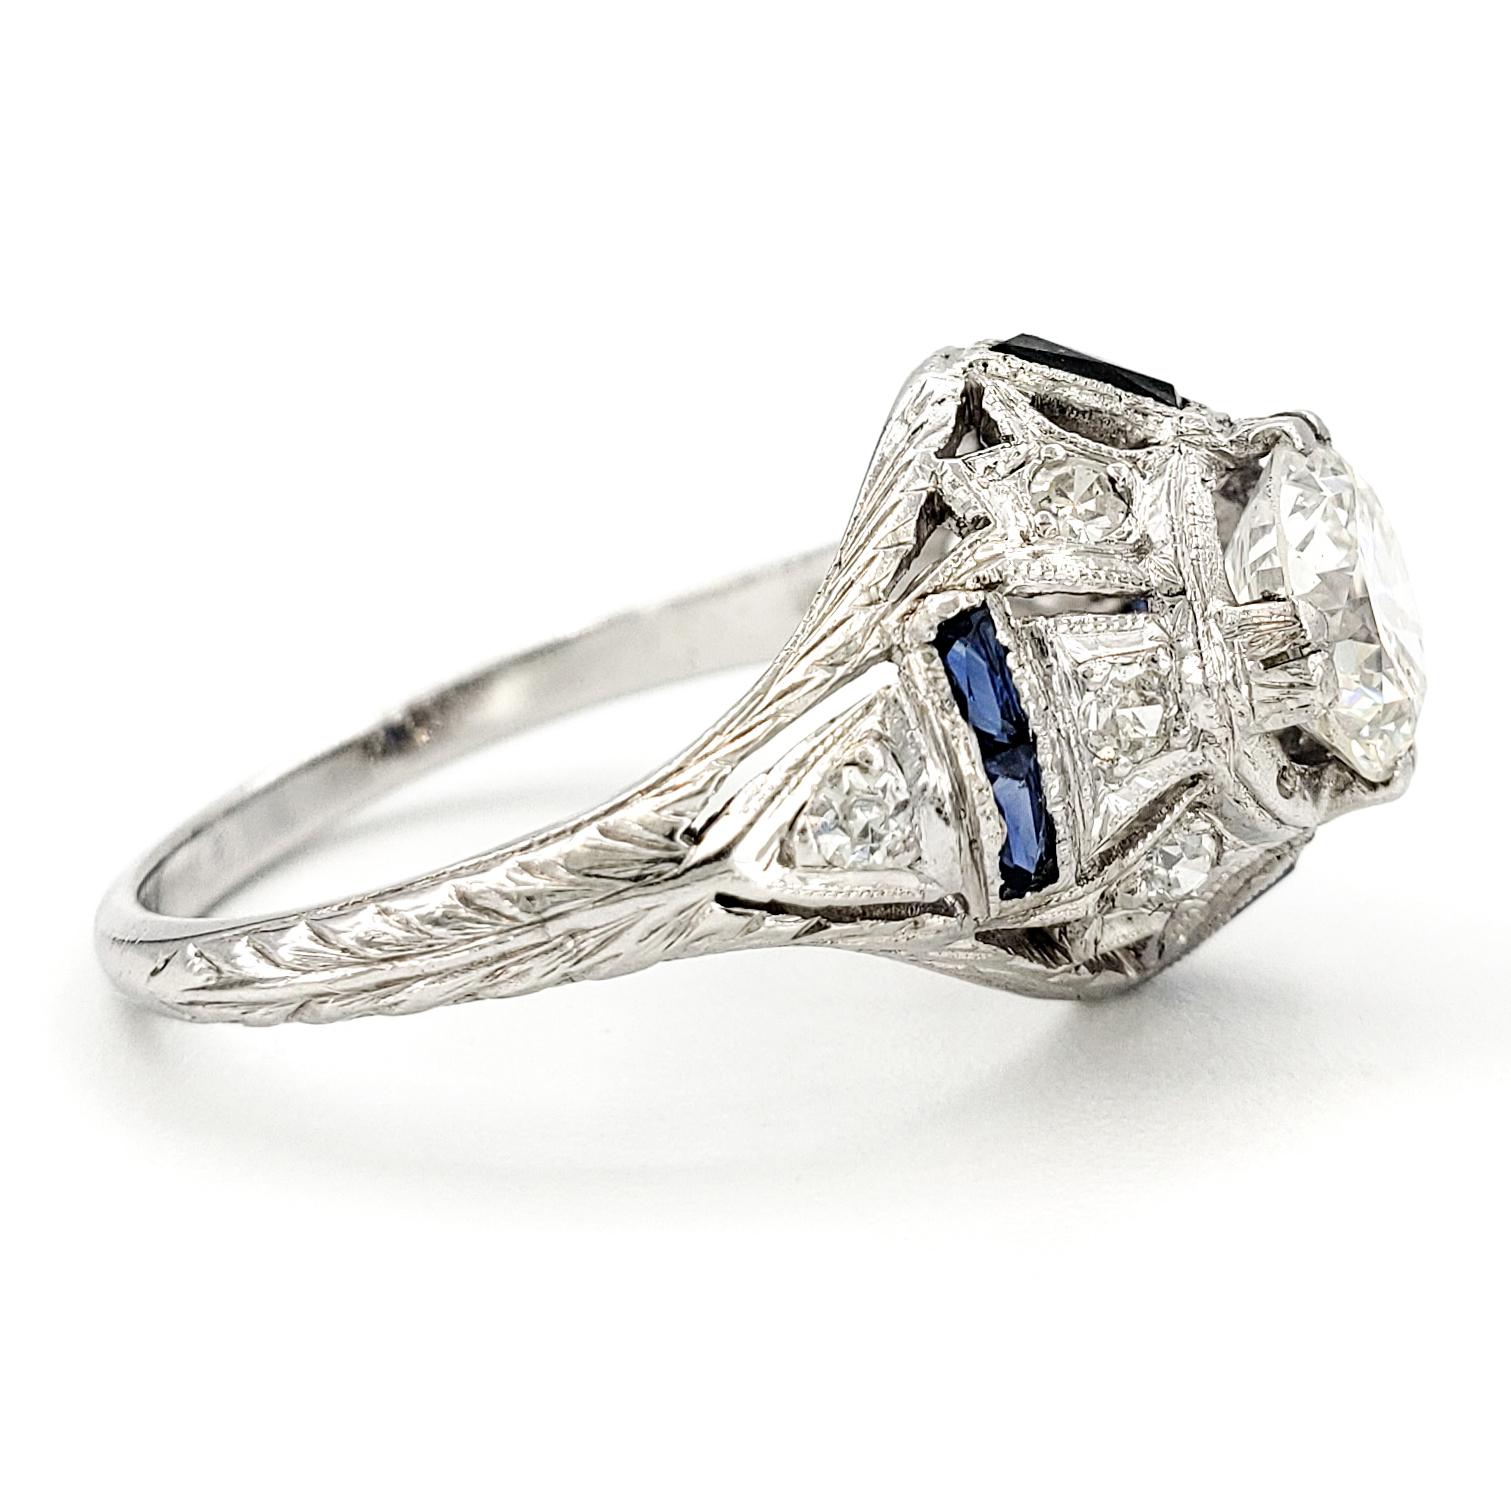 vintage-platinum-engagement-ring-with-0-93-carat-old-european-cut-diamond-egl-h-vs1-2